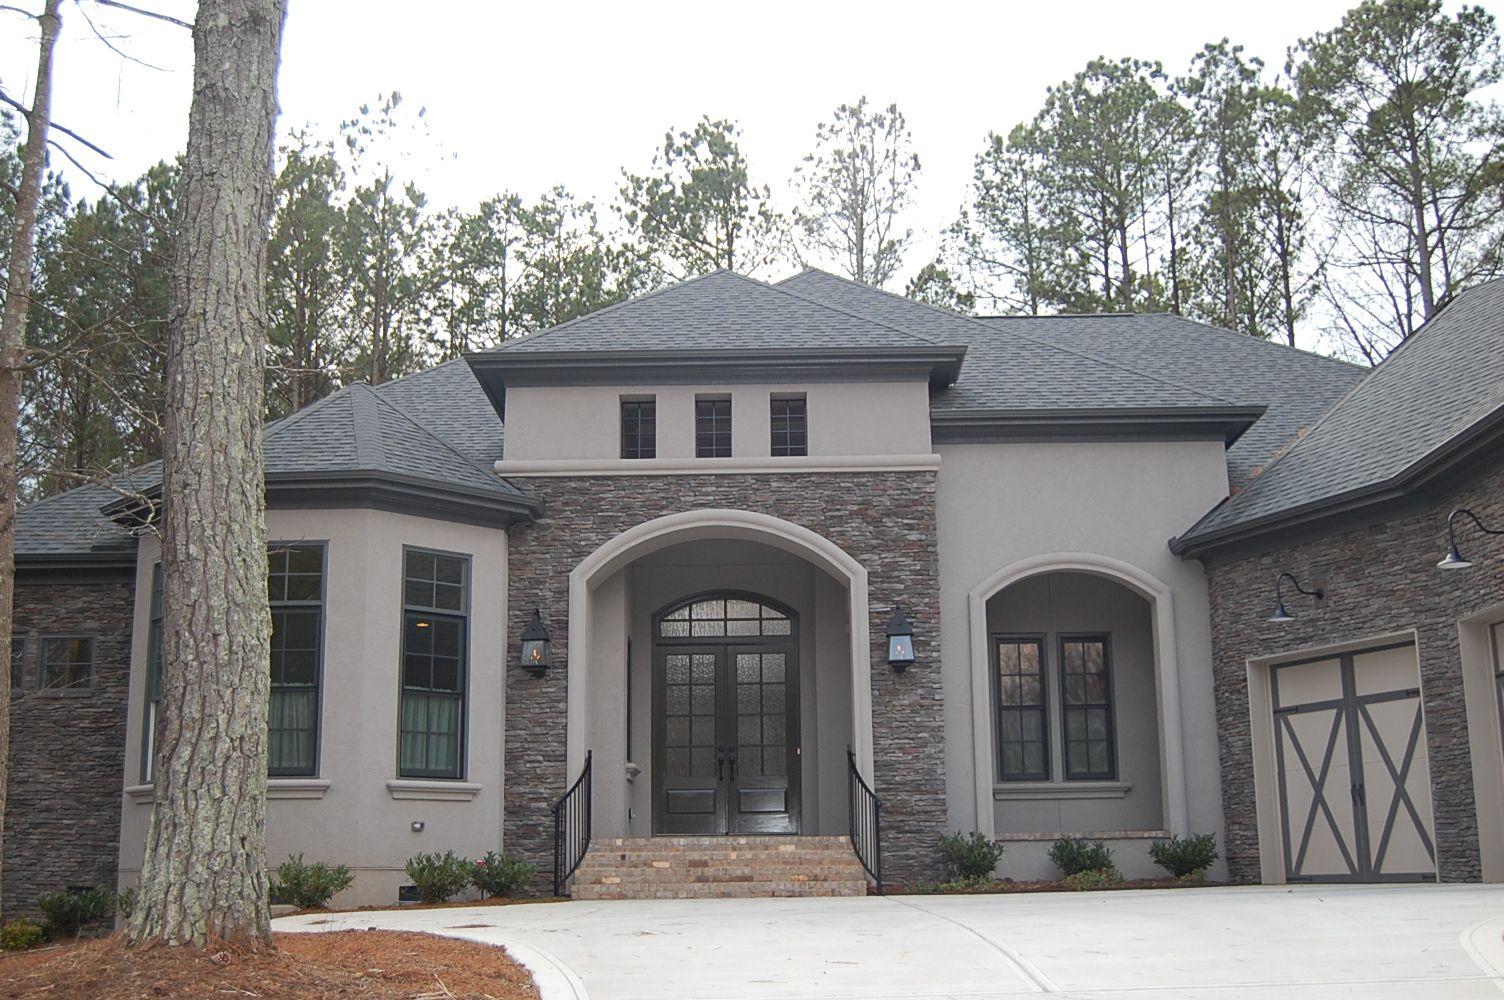 Arh plan the bermeda 1129f exterior 16 stone coronado - Exterior paint coverage on stucco ...